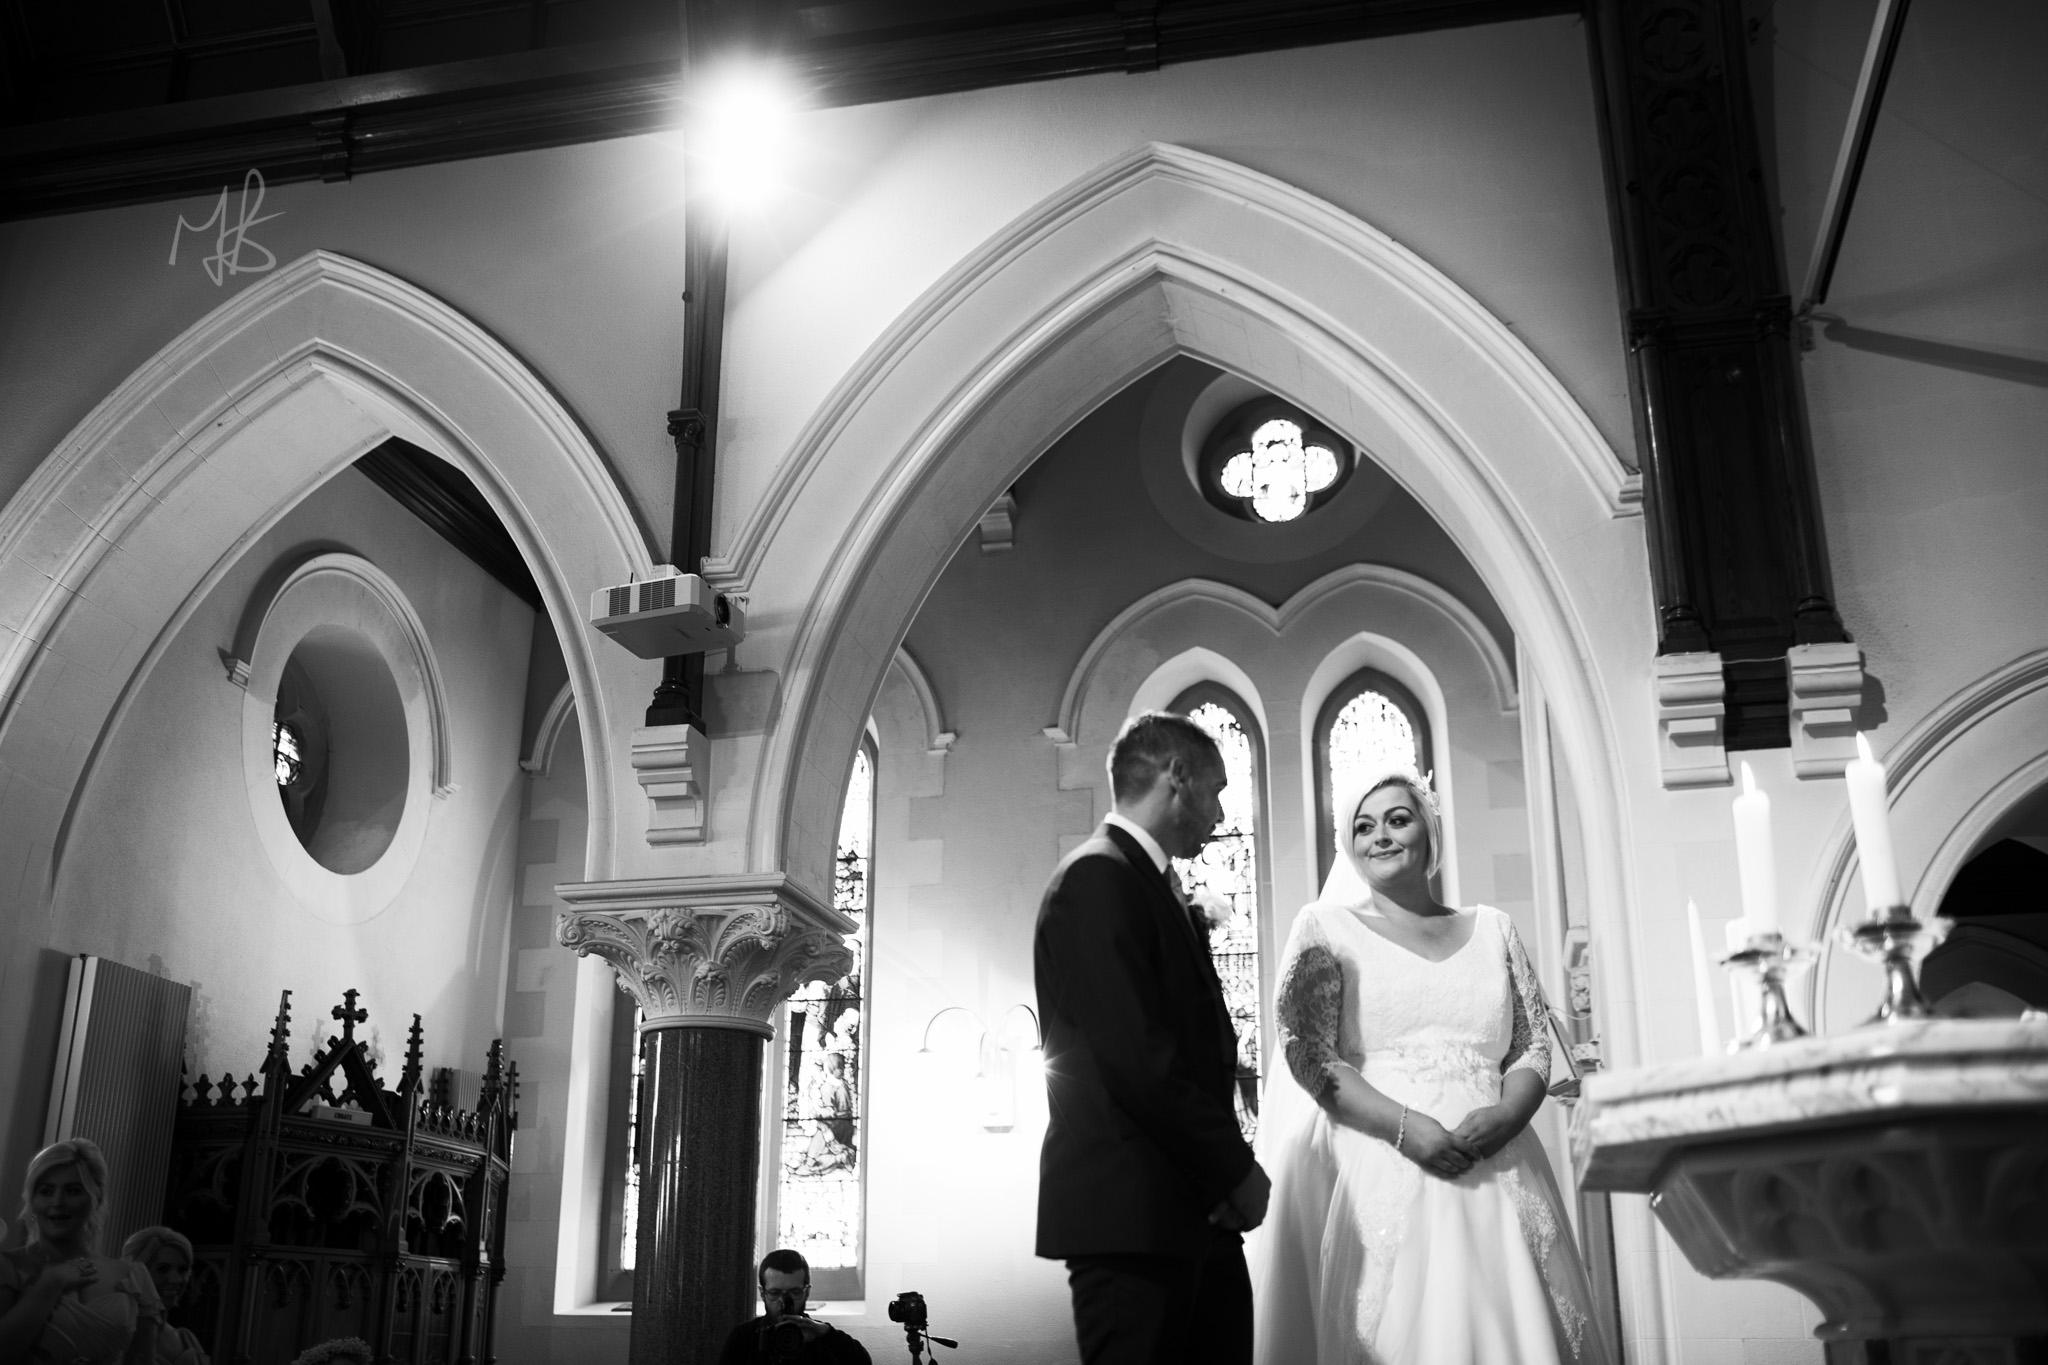 Northern-Ireland-Wedding-Photographer-Mark-Barnes-Ballymena_wedding-photography-Leighinmohr-House-Seamas_Alanna_For-web-19.jpg